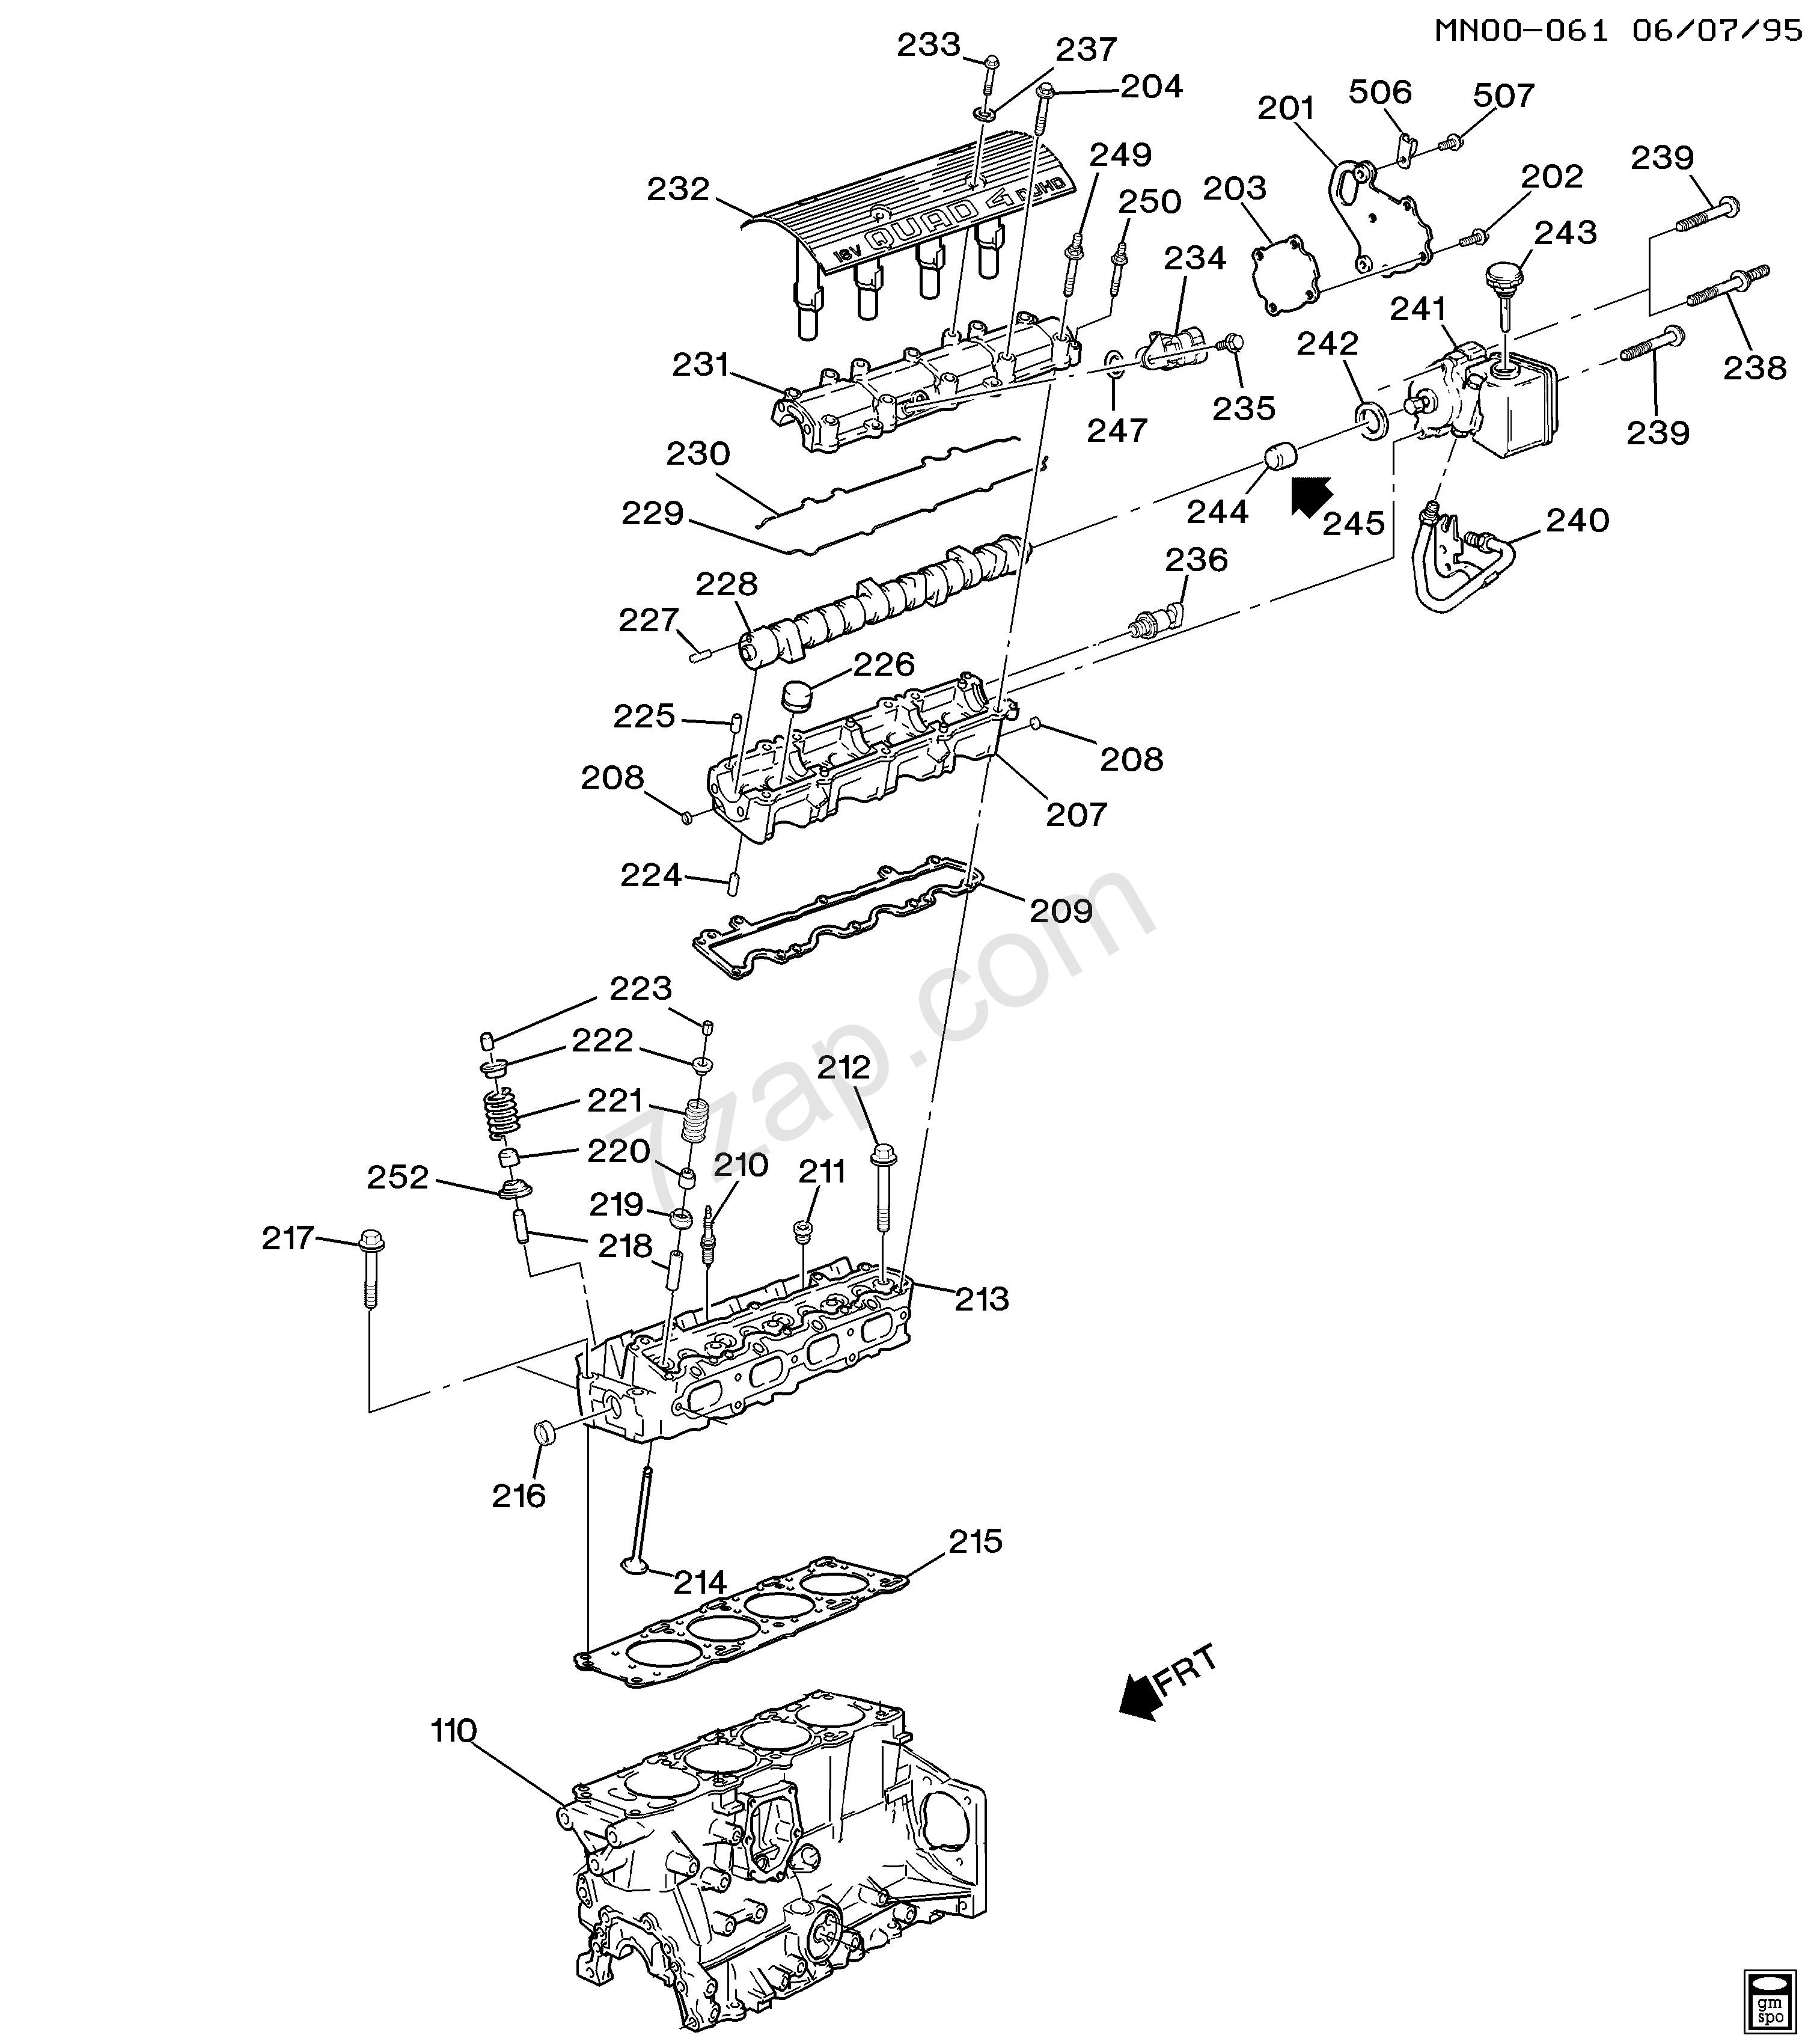 2002 Chevy Cavalier Engine Diagram 2001 2002 J Engine asm 2 4l L4 Part 2 Cylinder Head Of 2002 Chevy Cavalier Engine Diagram